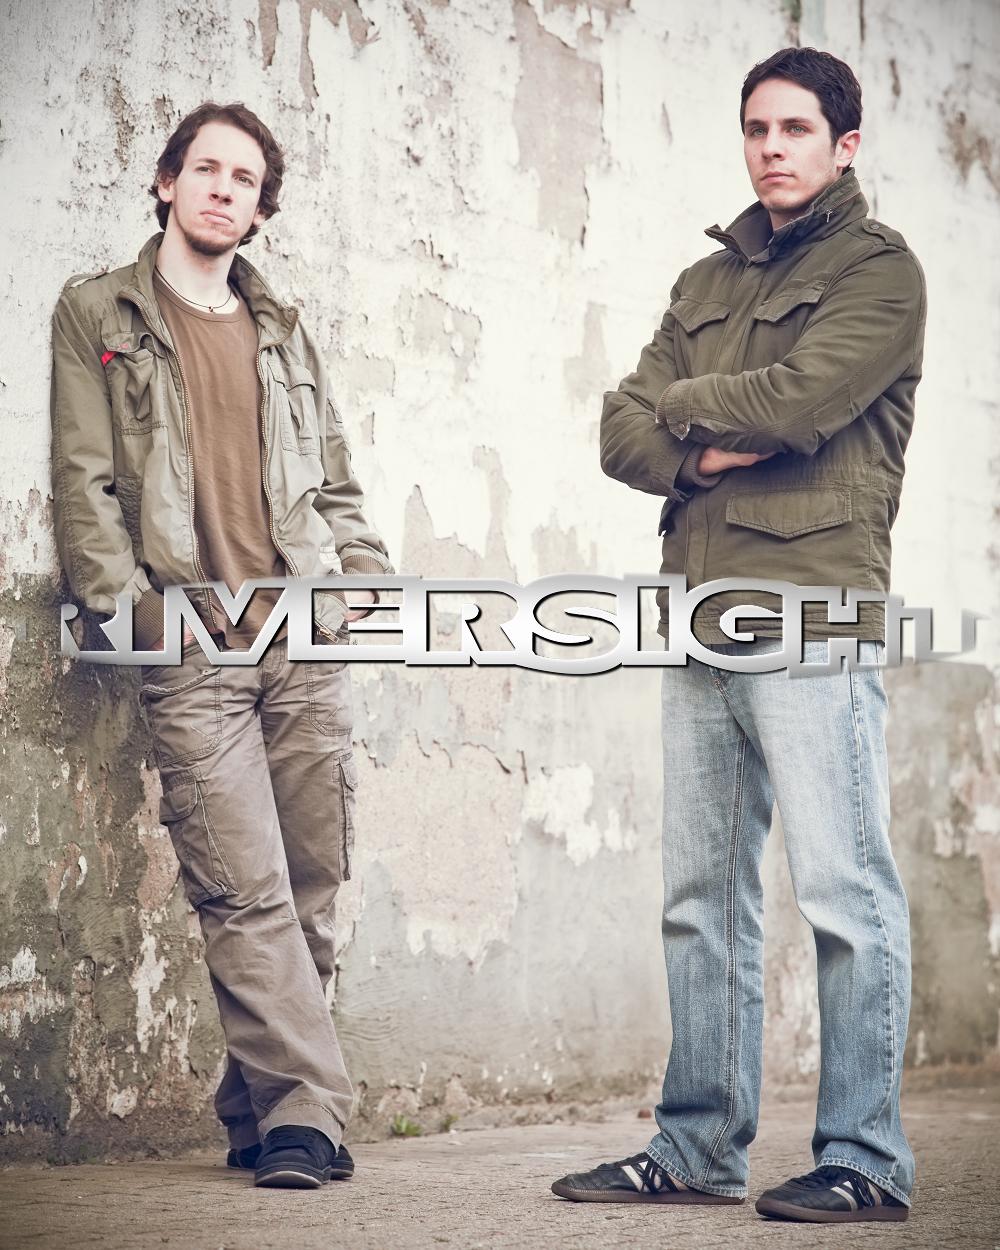 riversight 3